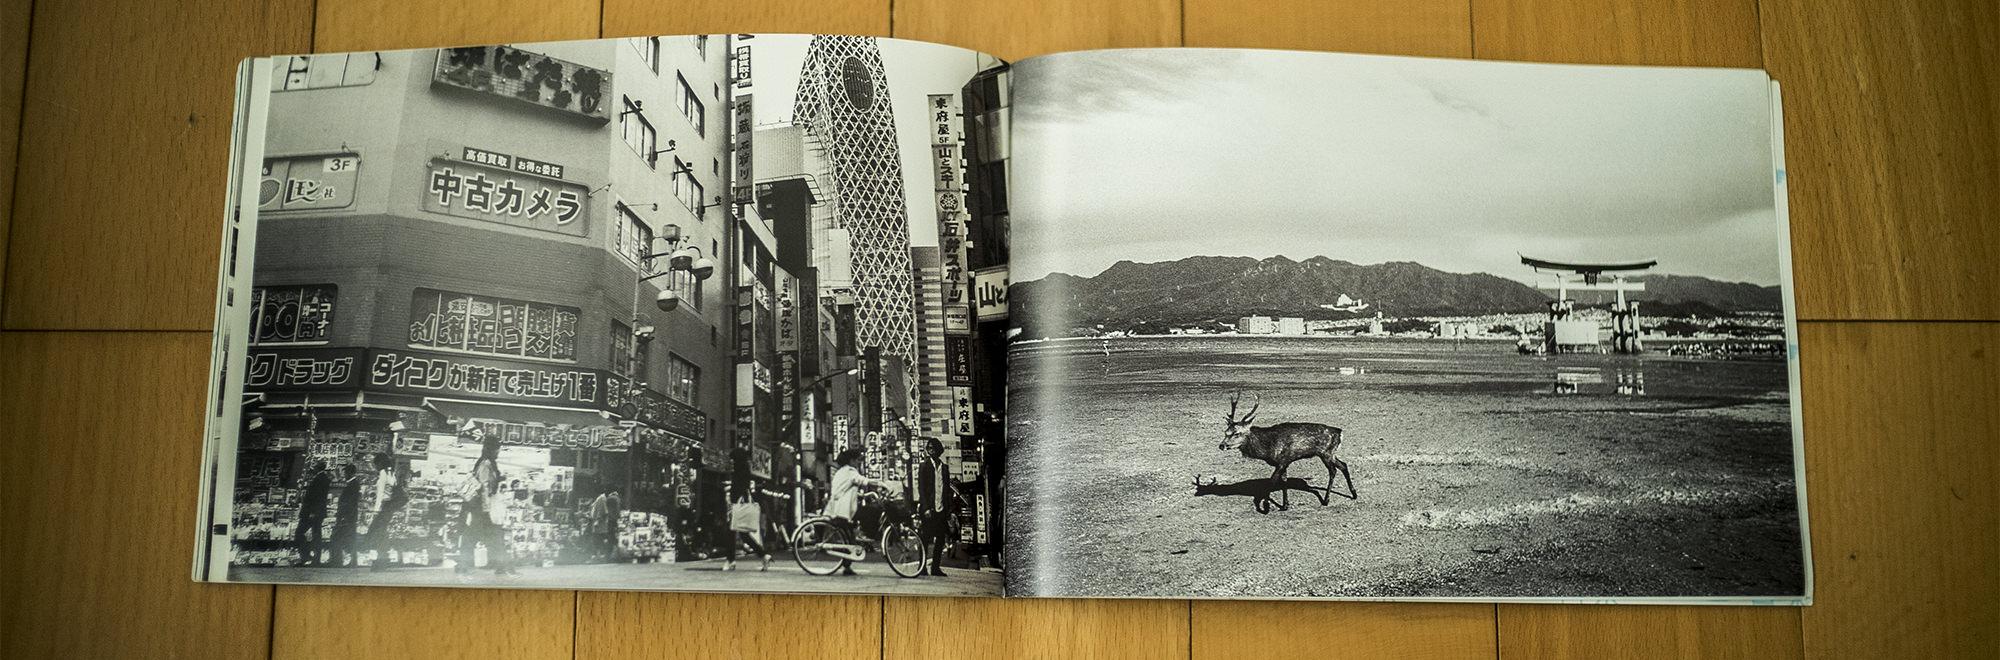 Old Friend Japan Page 17 LOWQ